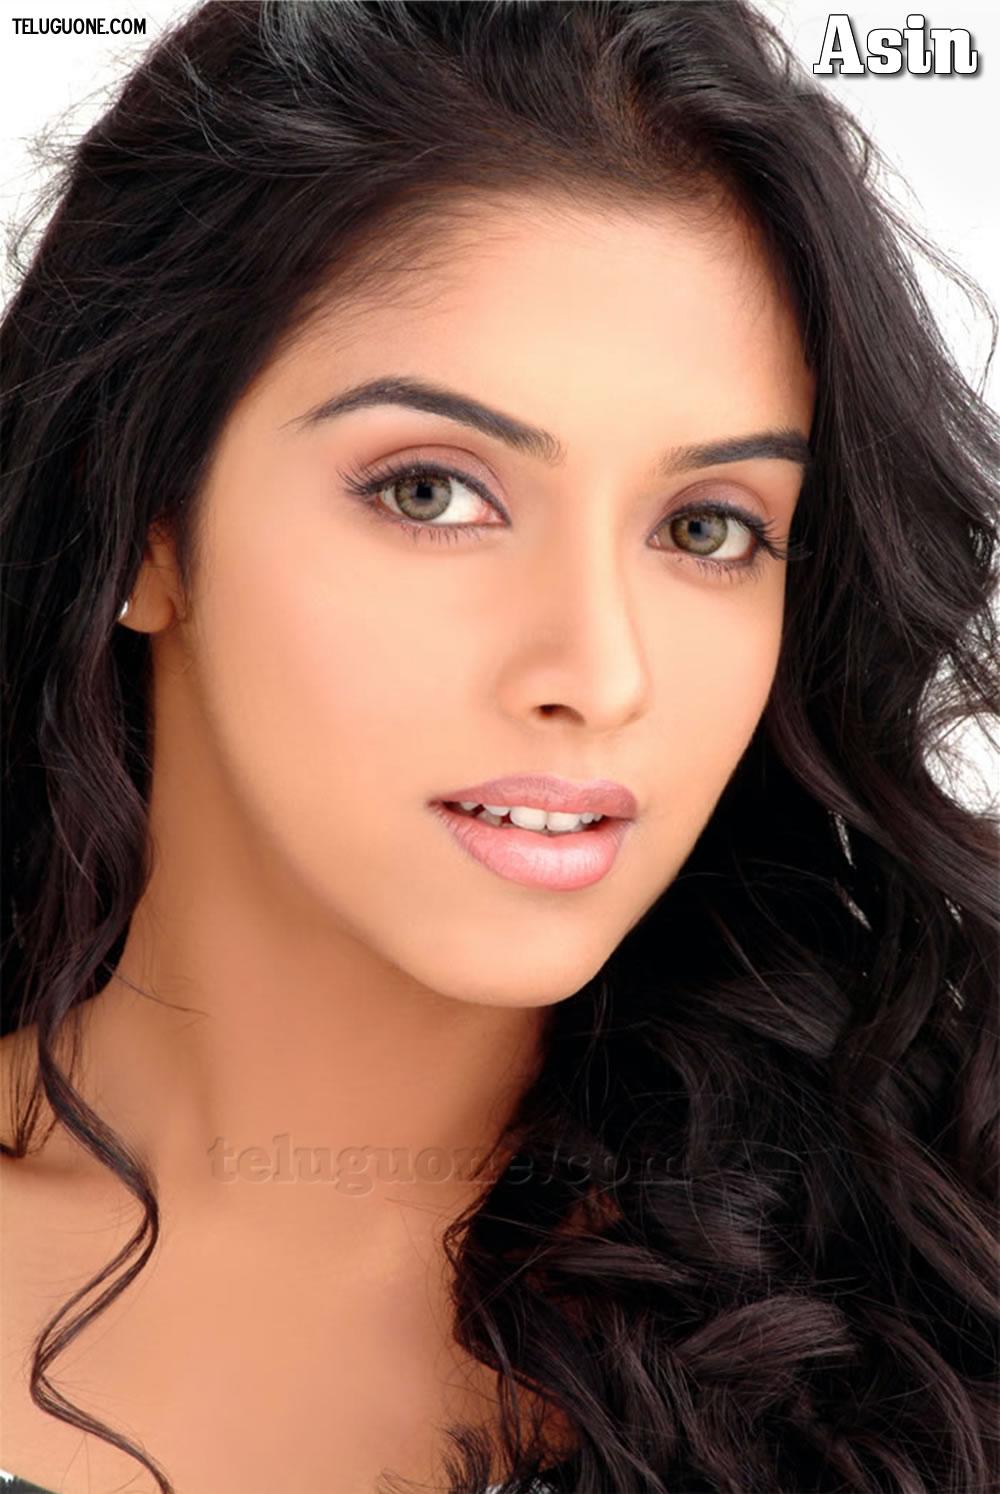 South indian actress stills wallpapers asin hot stills - South indian actress wallpaper ...